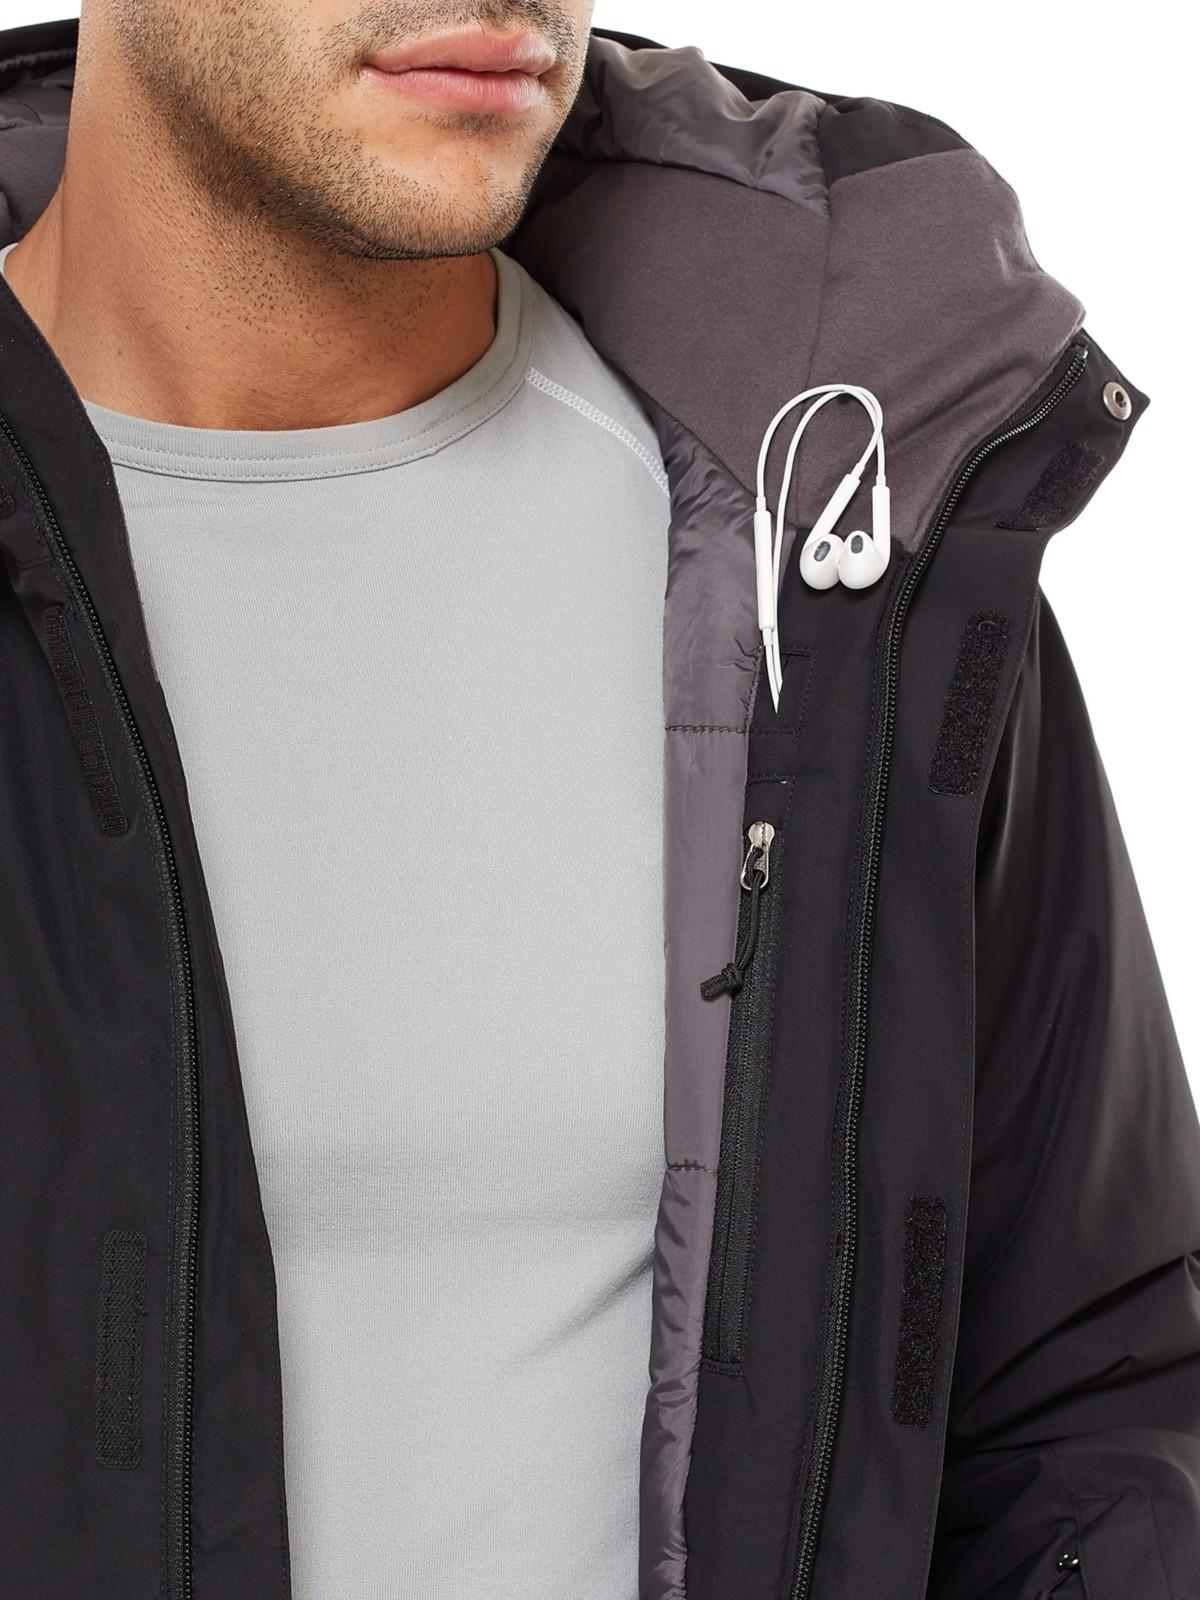 The North Face Synthetic Descendit Waterproof Men's Jacket in Black for Men